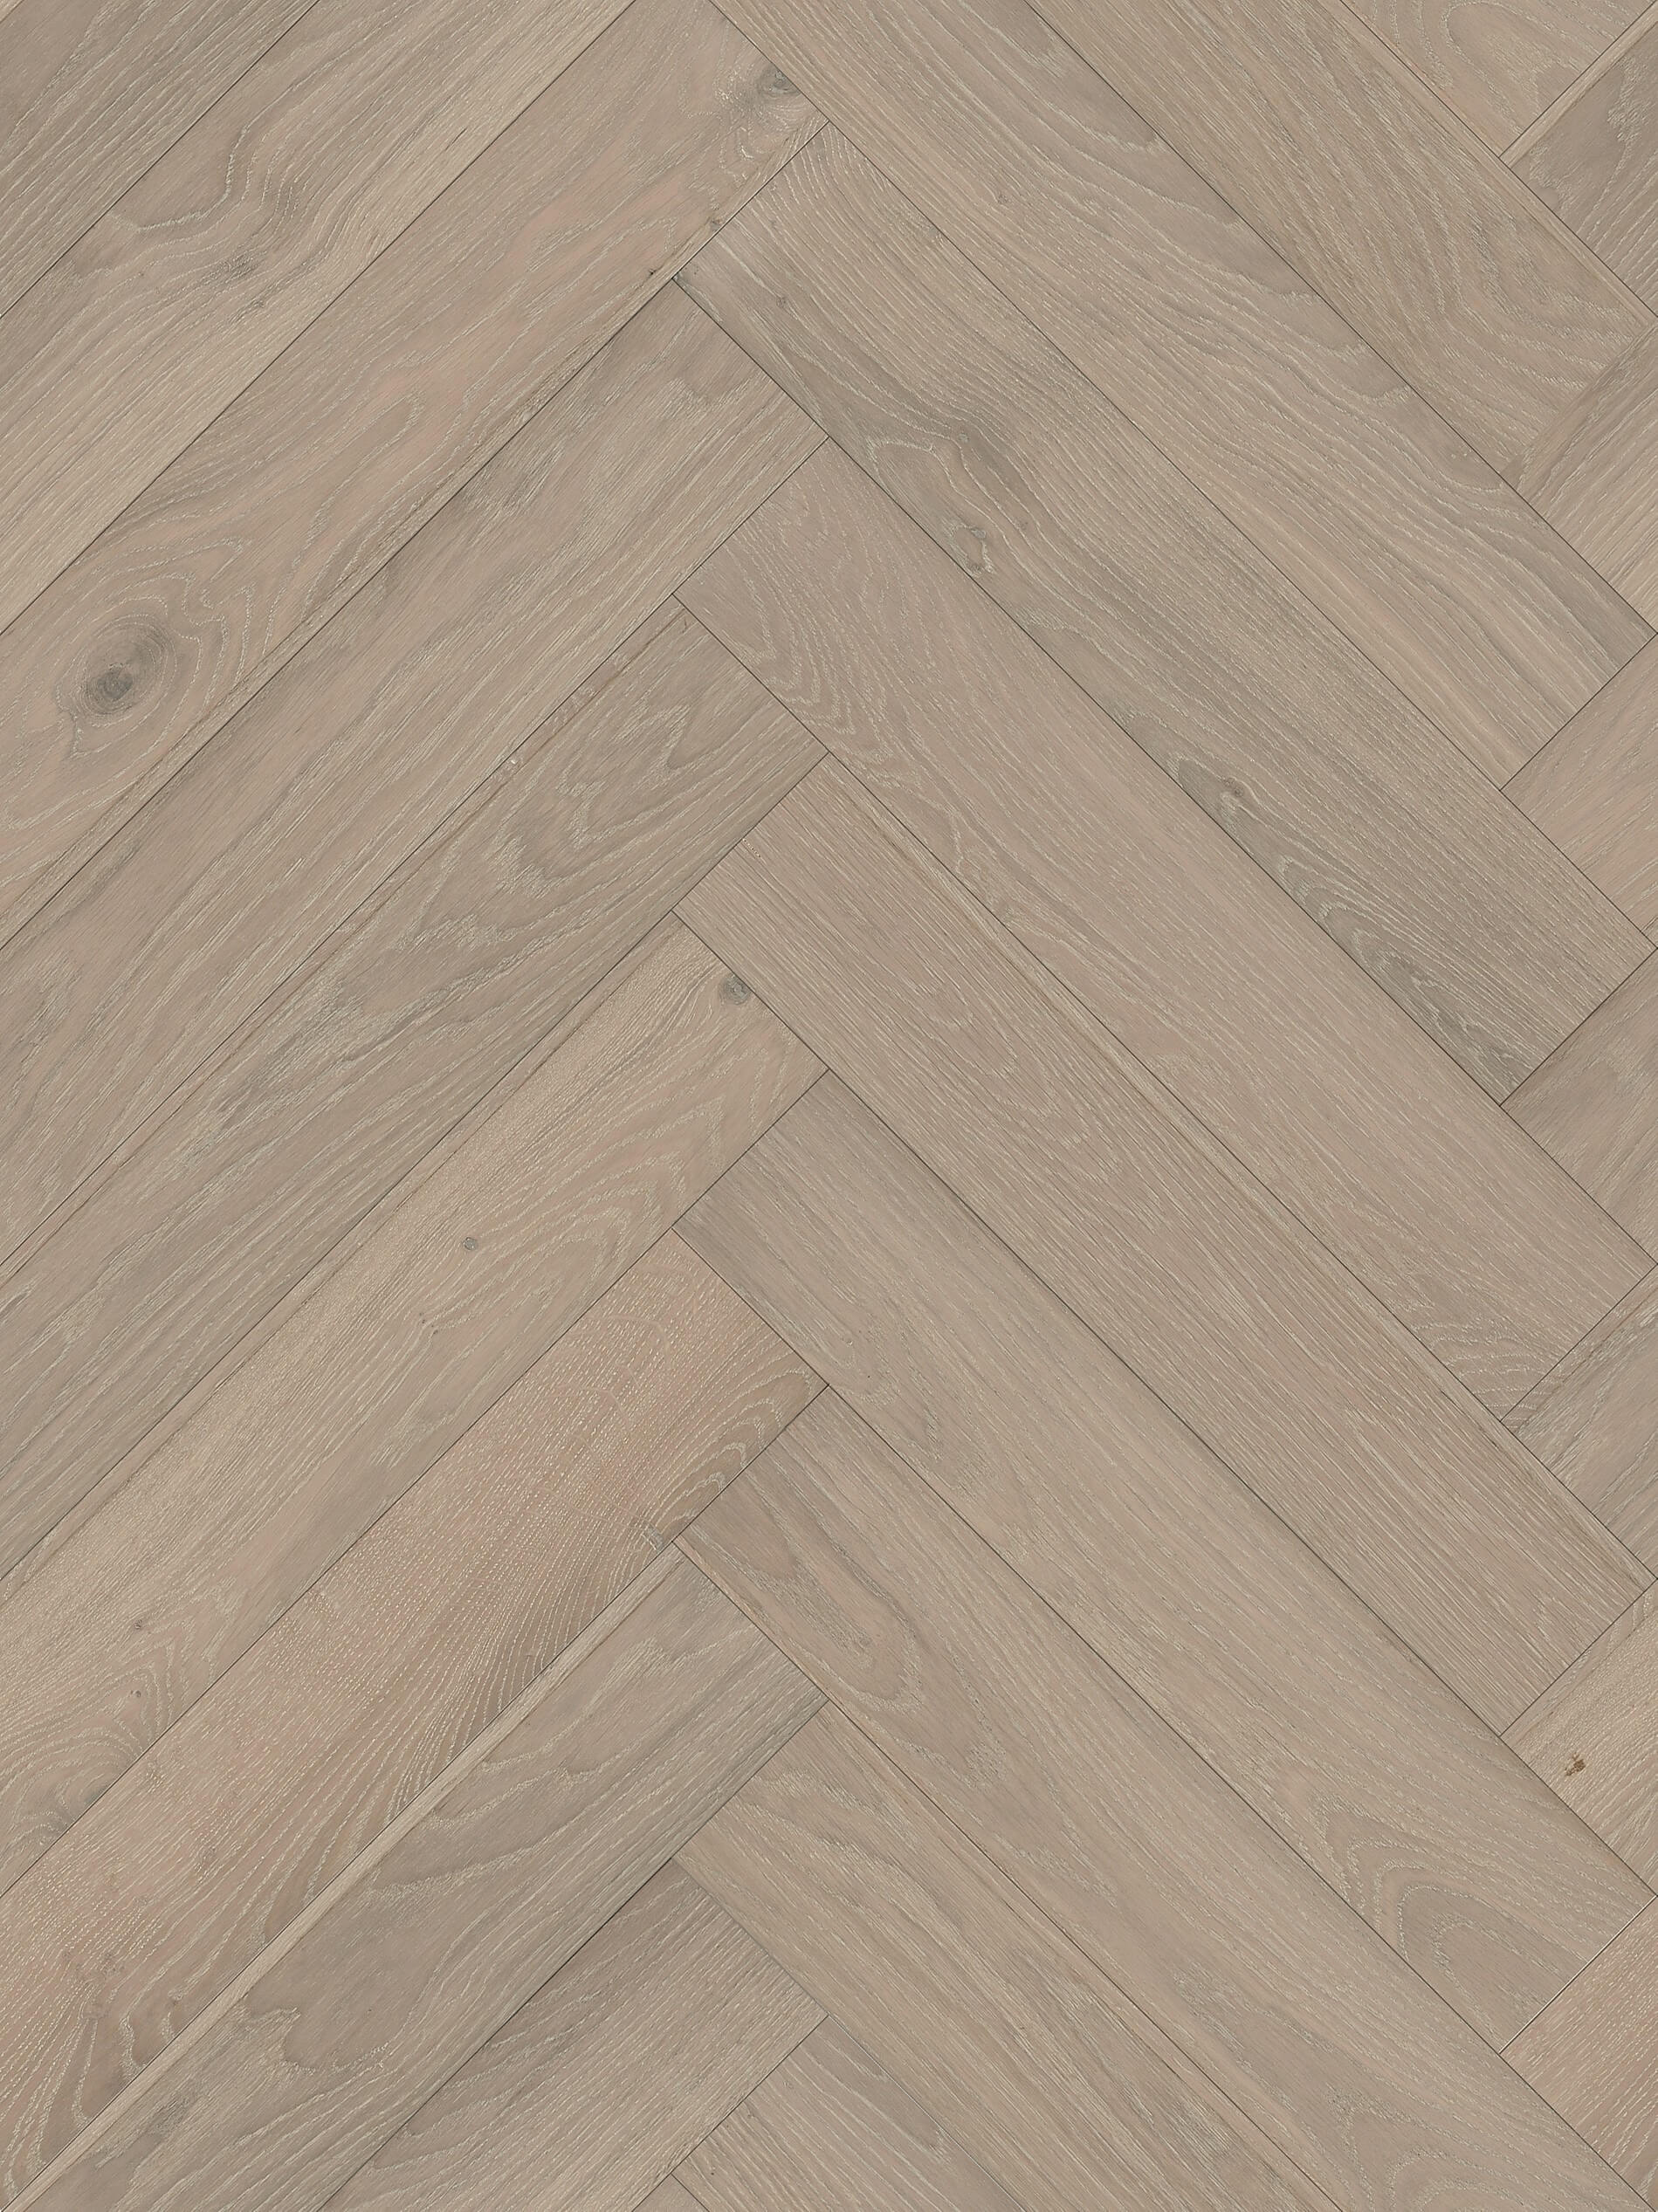 herringbone timber floor, flooring shop, engineered timber flooring, engineered timber flooring sydney, engineered timber floors, engineered timber floor, timber floor engineered, timber flooring sydney, timber floor sydney, oak floor, oak flooringoak flooring sydney